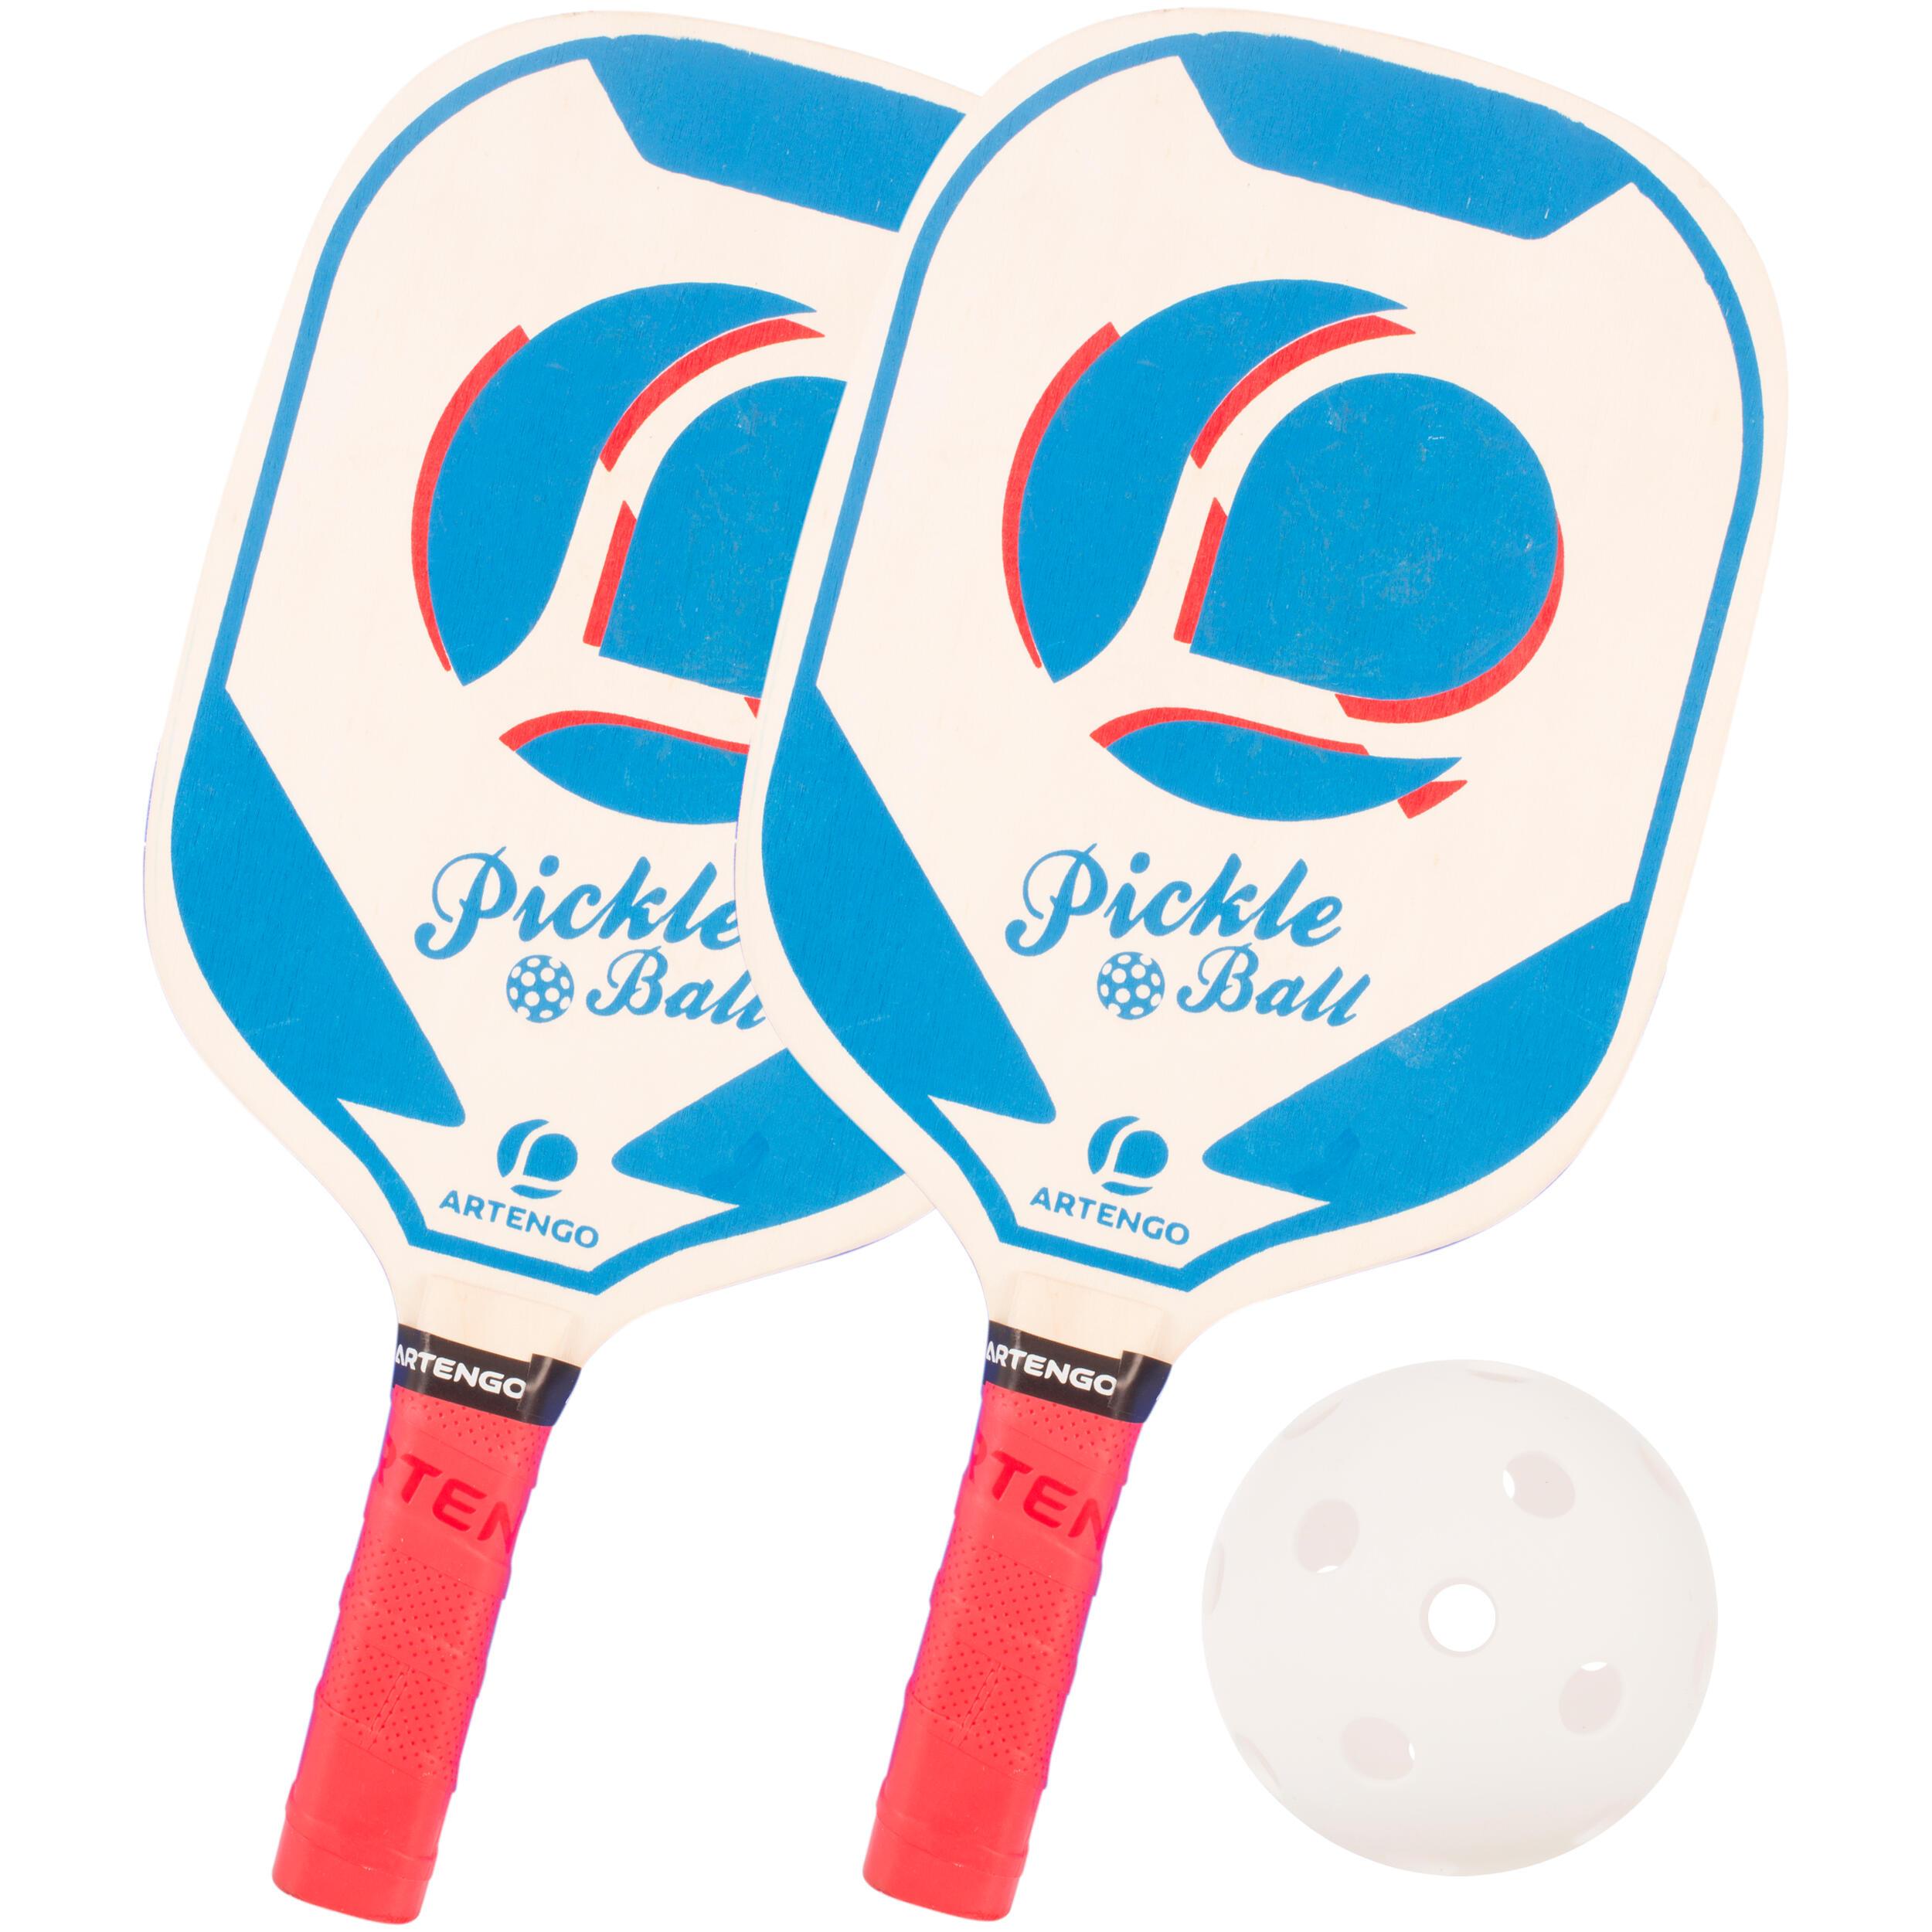 Pickleball Set of 2 Racquets - Blue